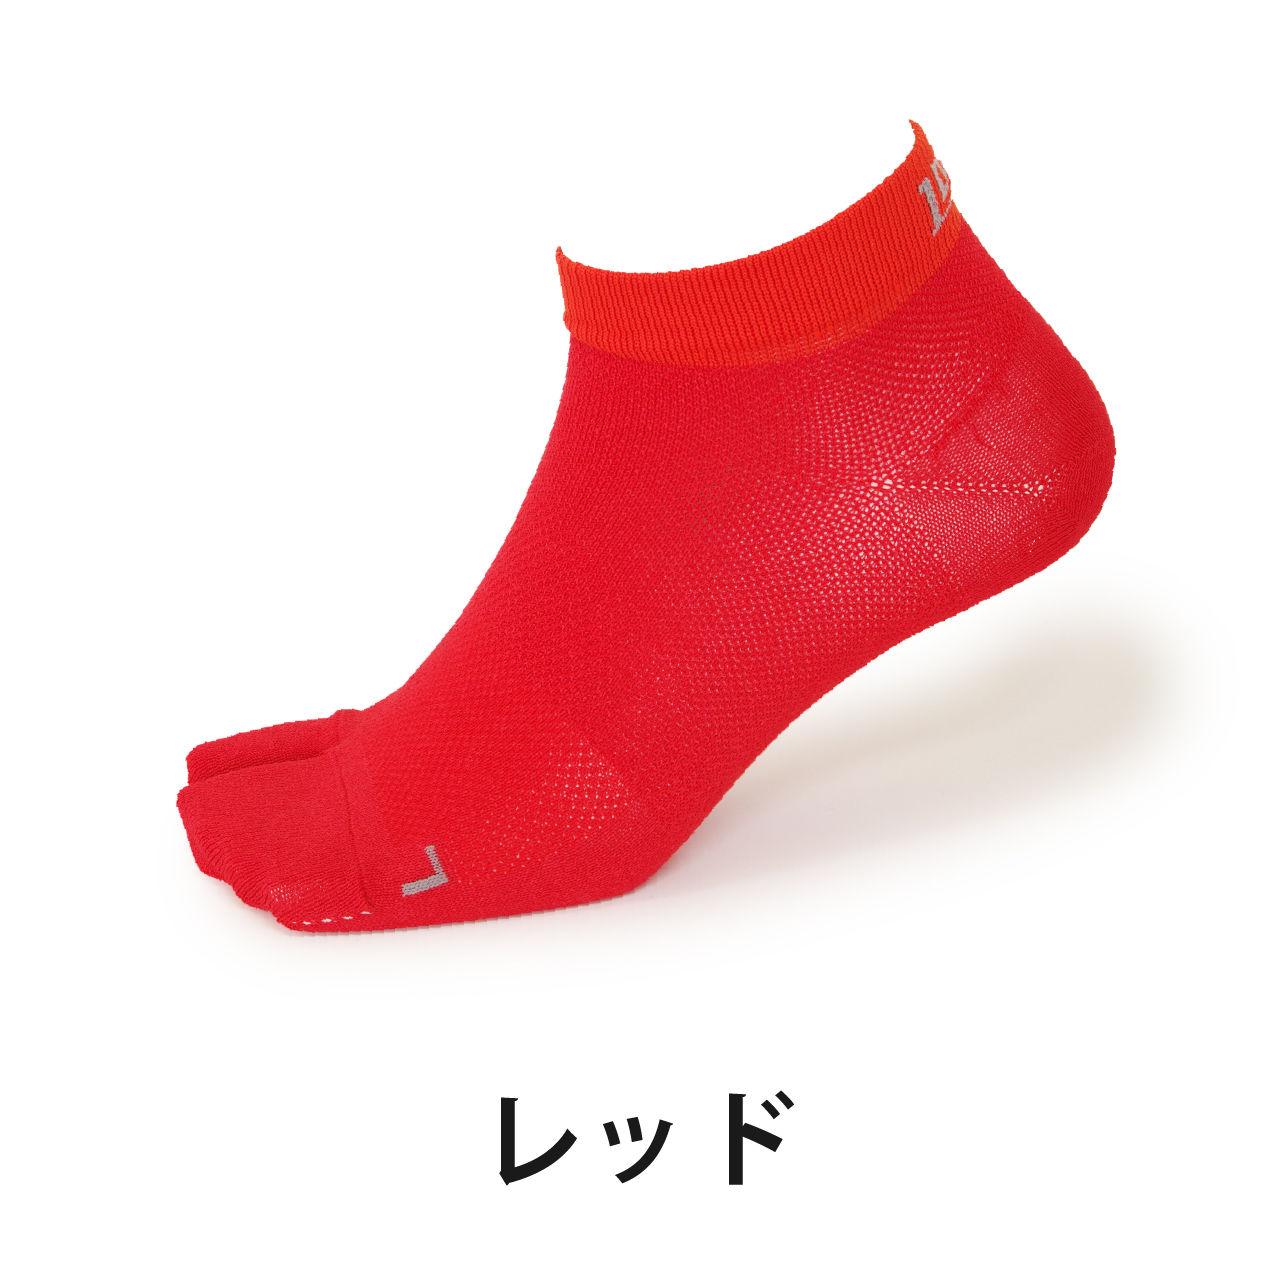 IDATEN足袋コンプレッション和紙ソックスショート丈(Sサイズ22-24cm)